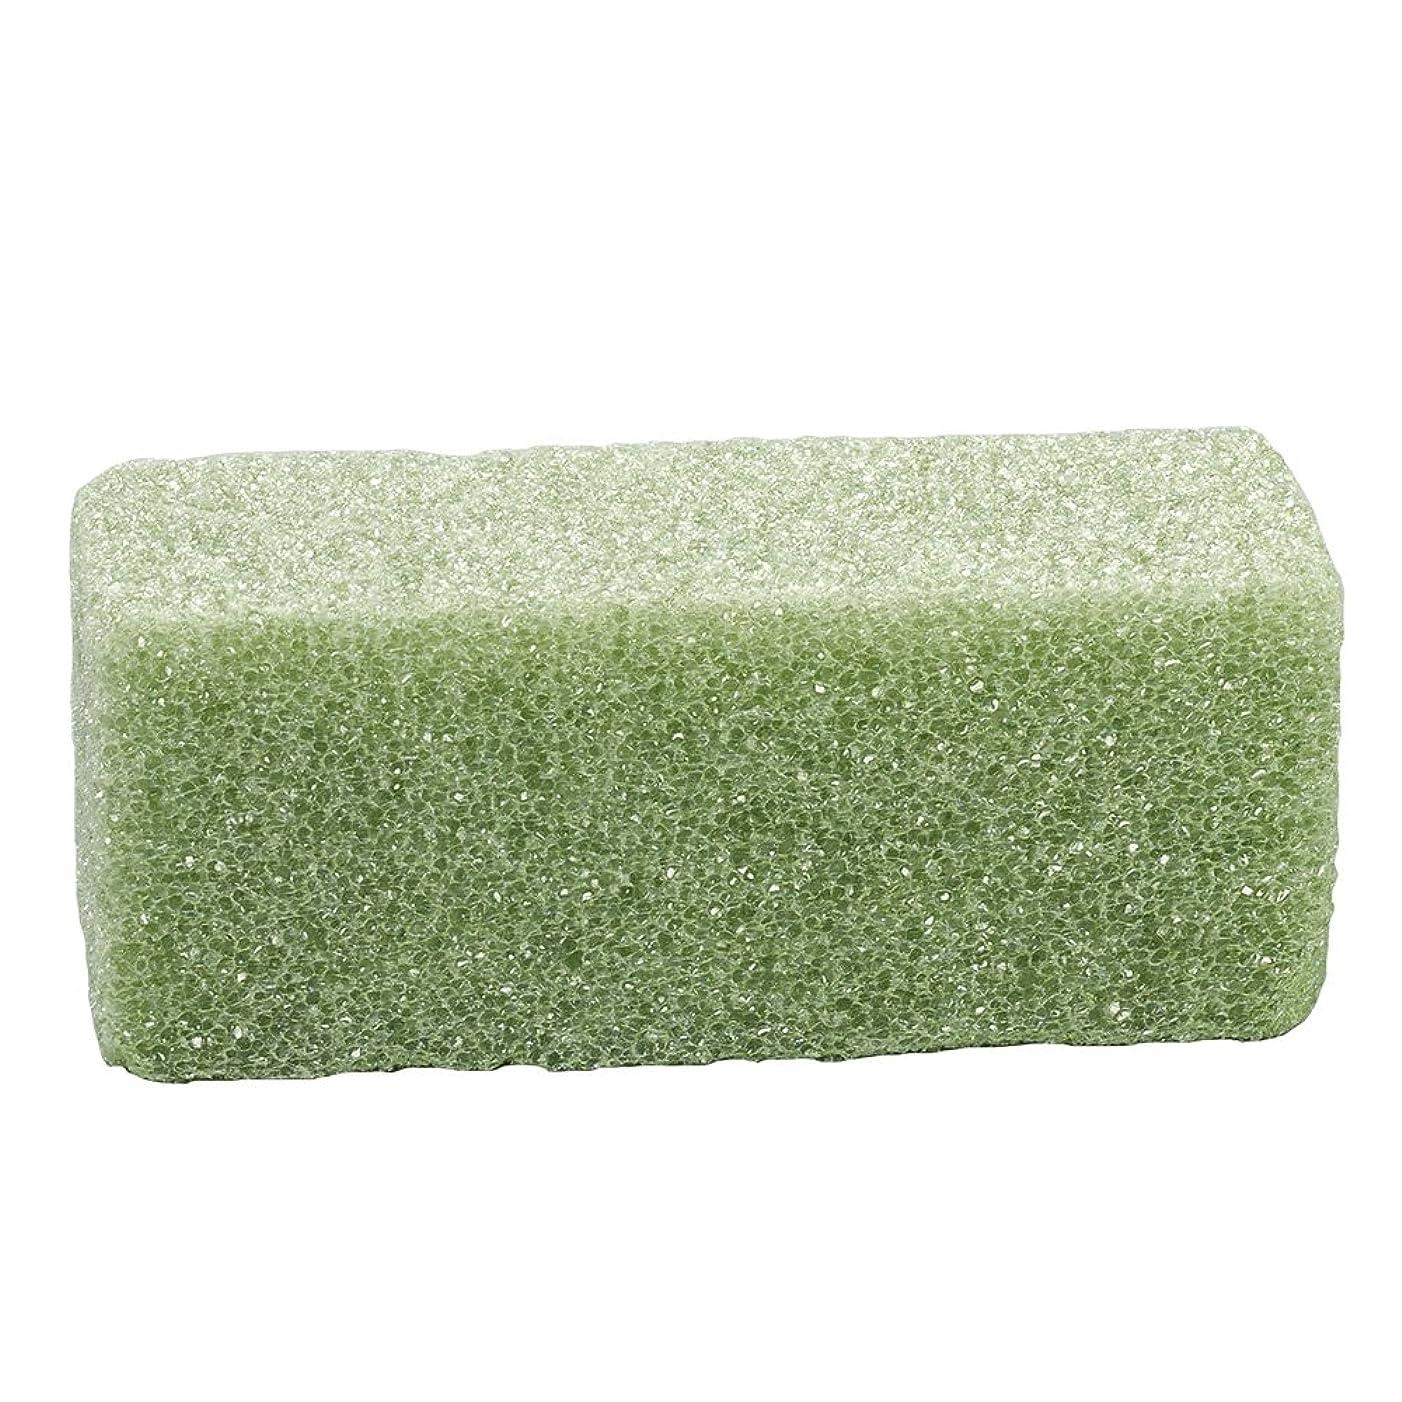 FloraCraft Styrofoam Block 1.9 Inch x 1.9 Inch x 4.8 Inch Green